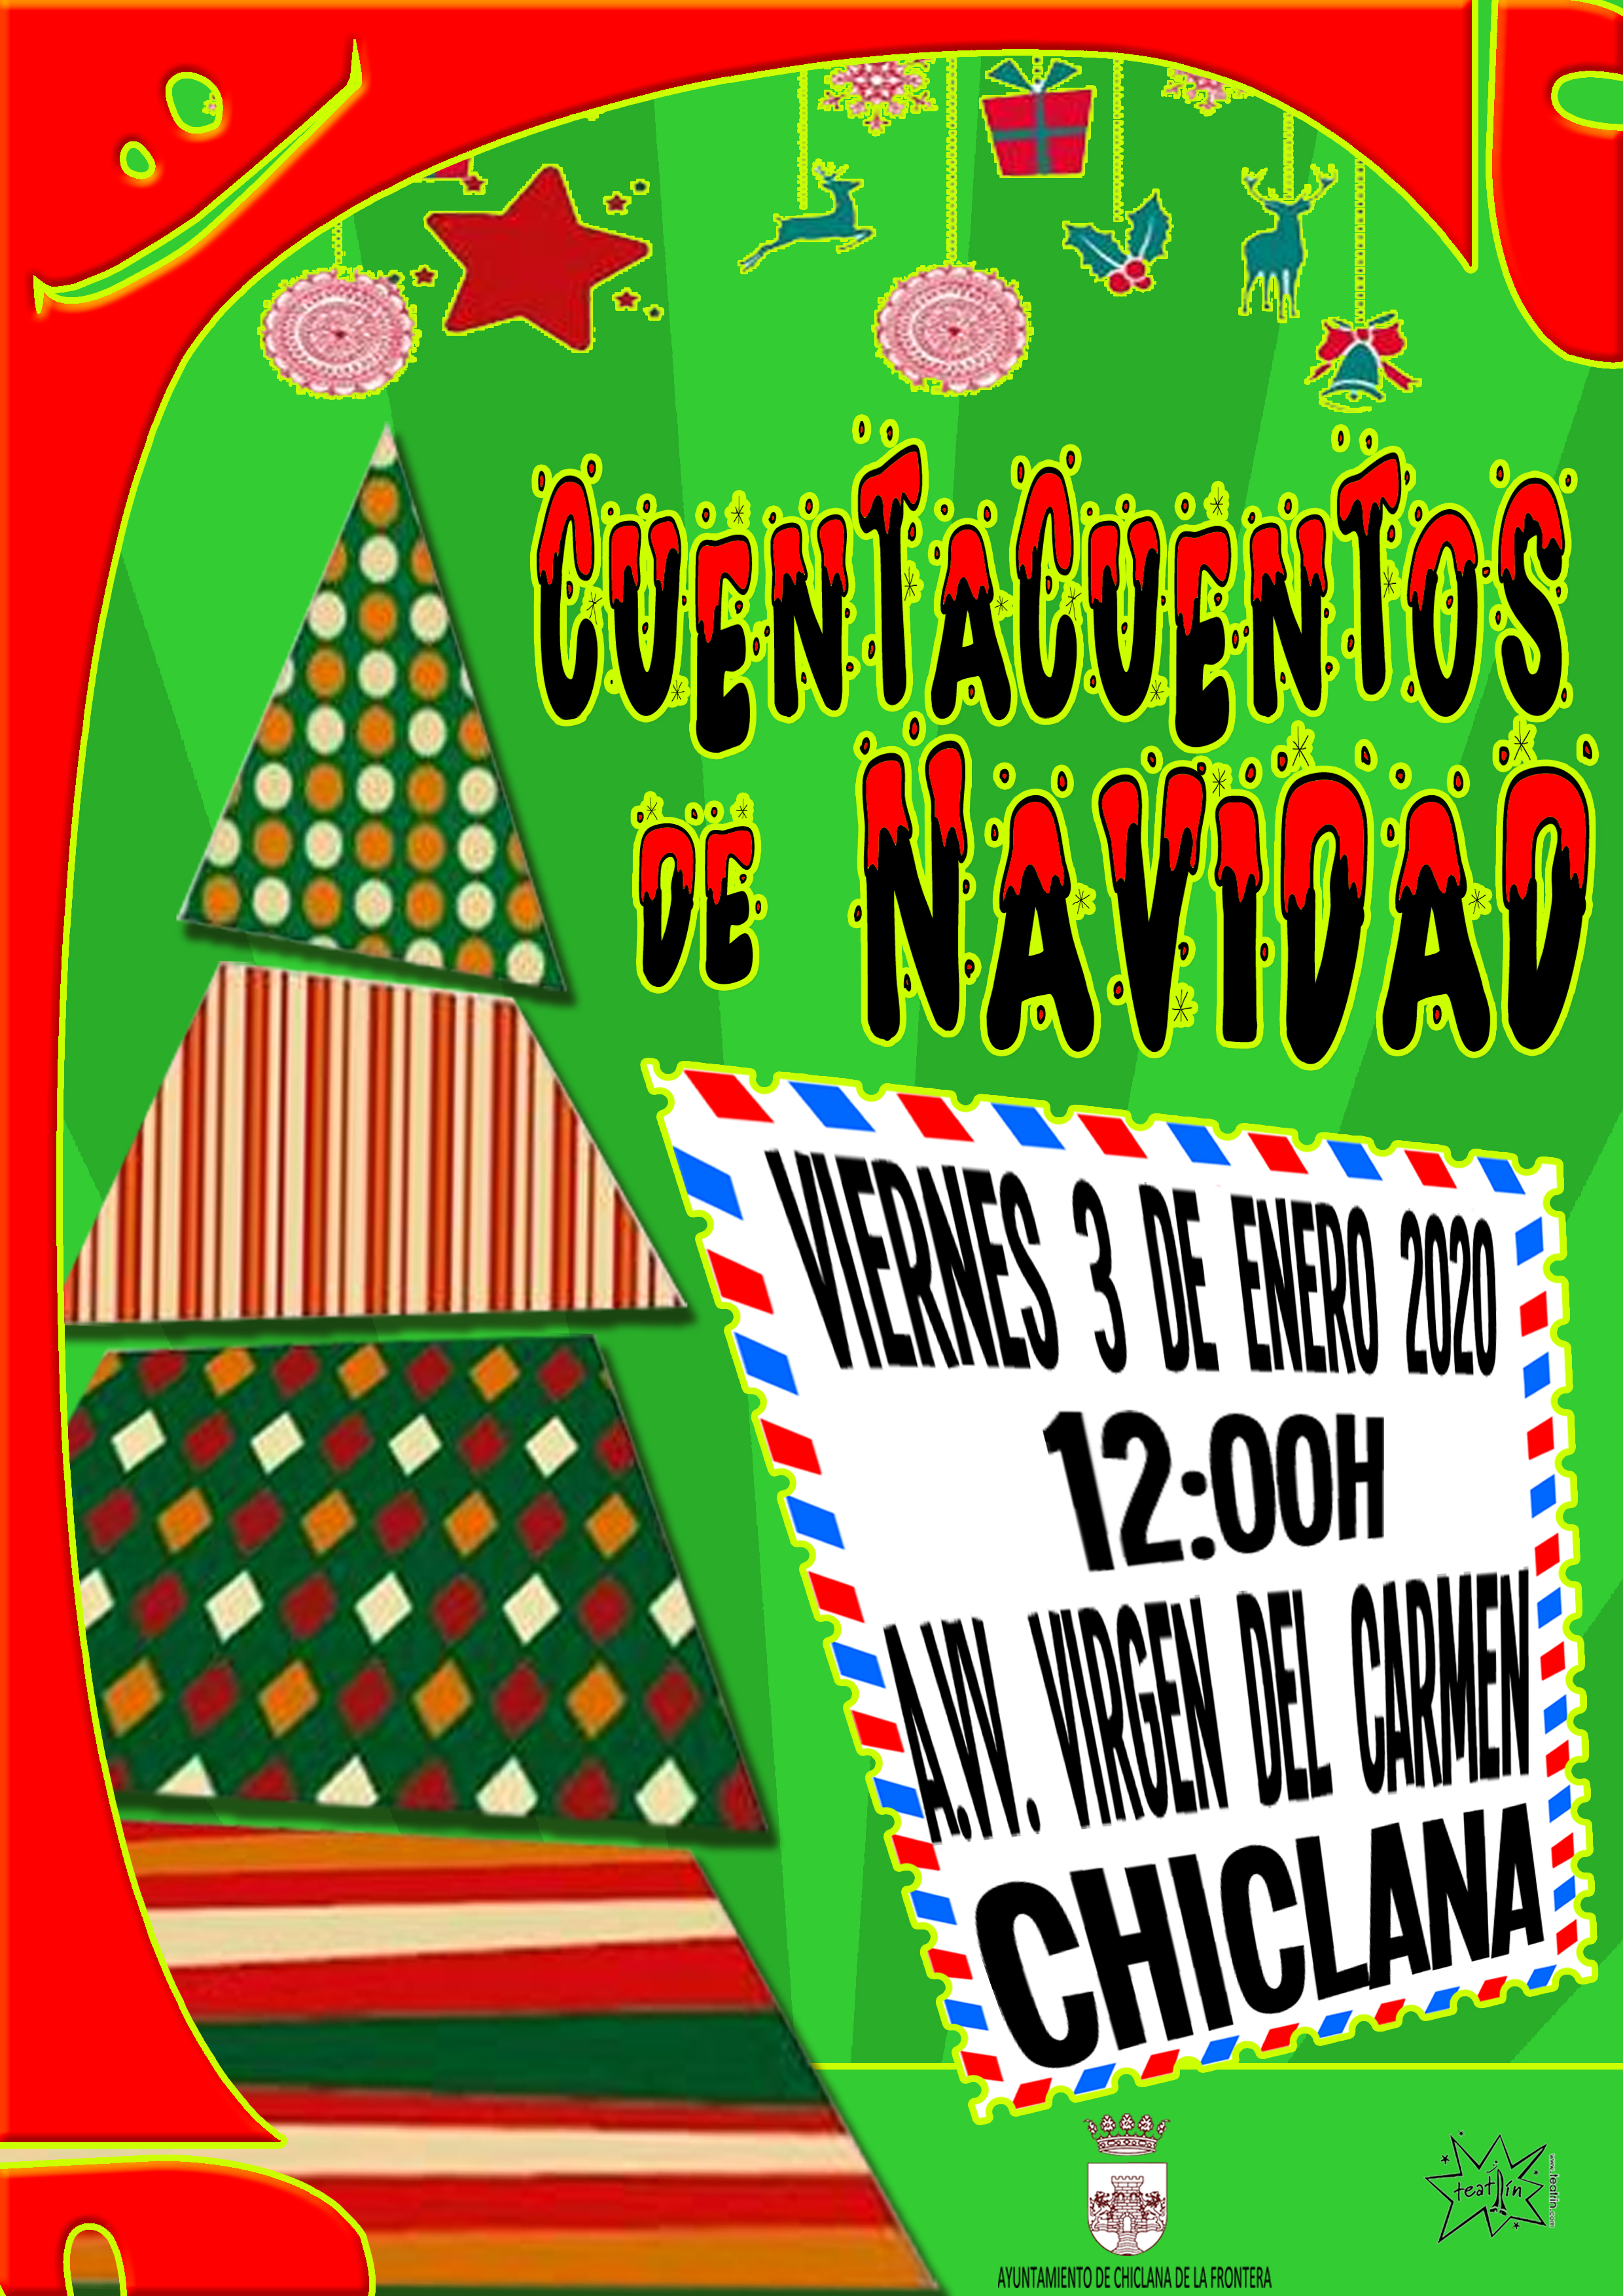 CC_NAVIDAD_CHICLANA_ENE2020.jpg